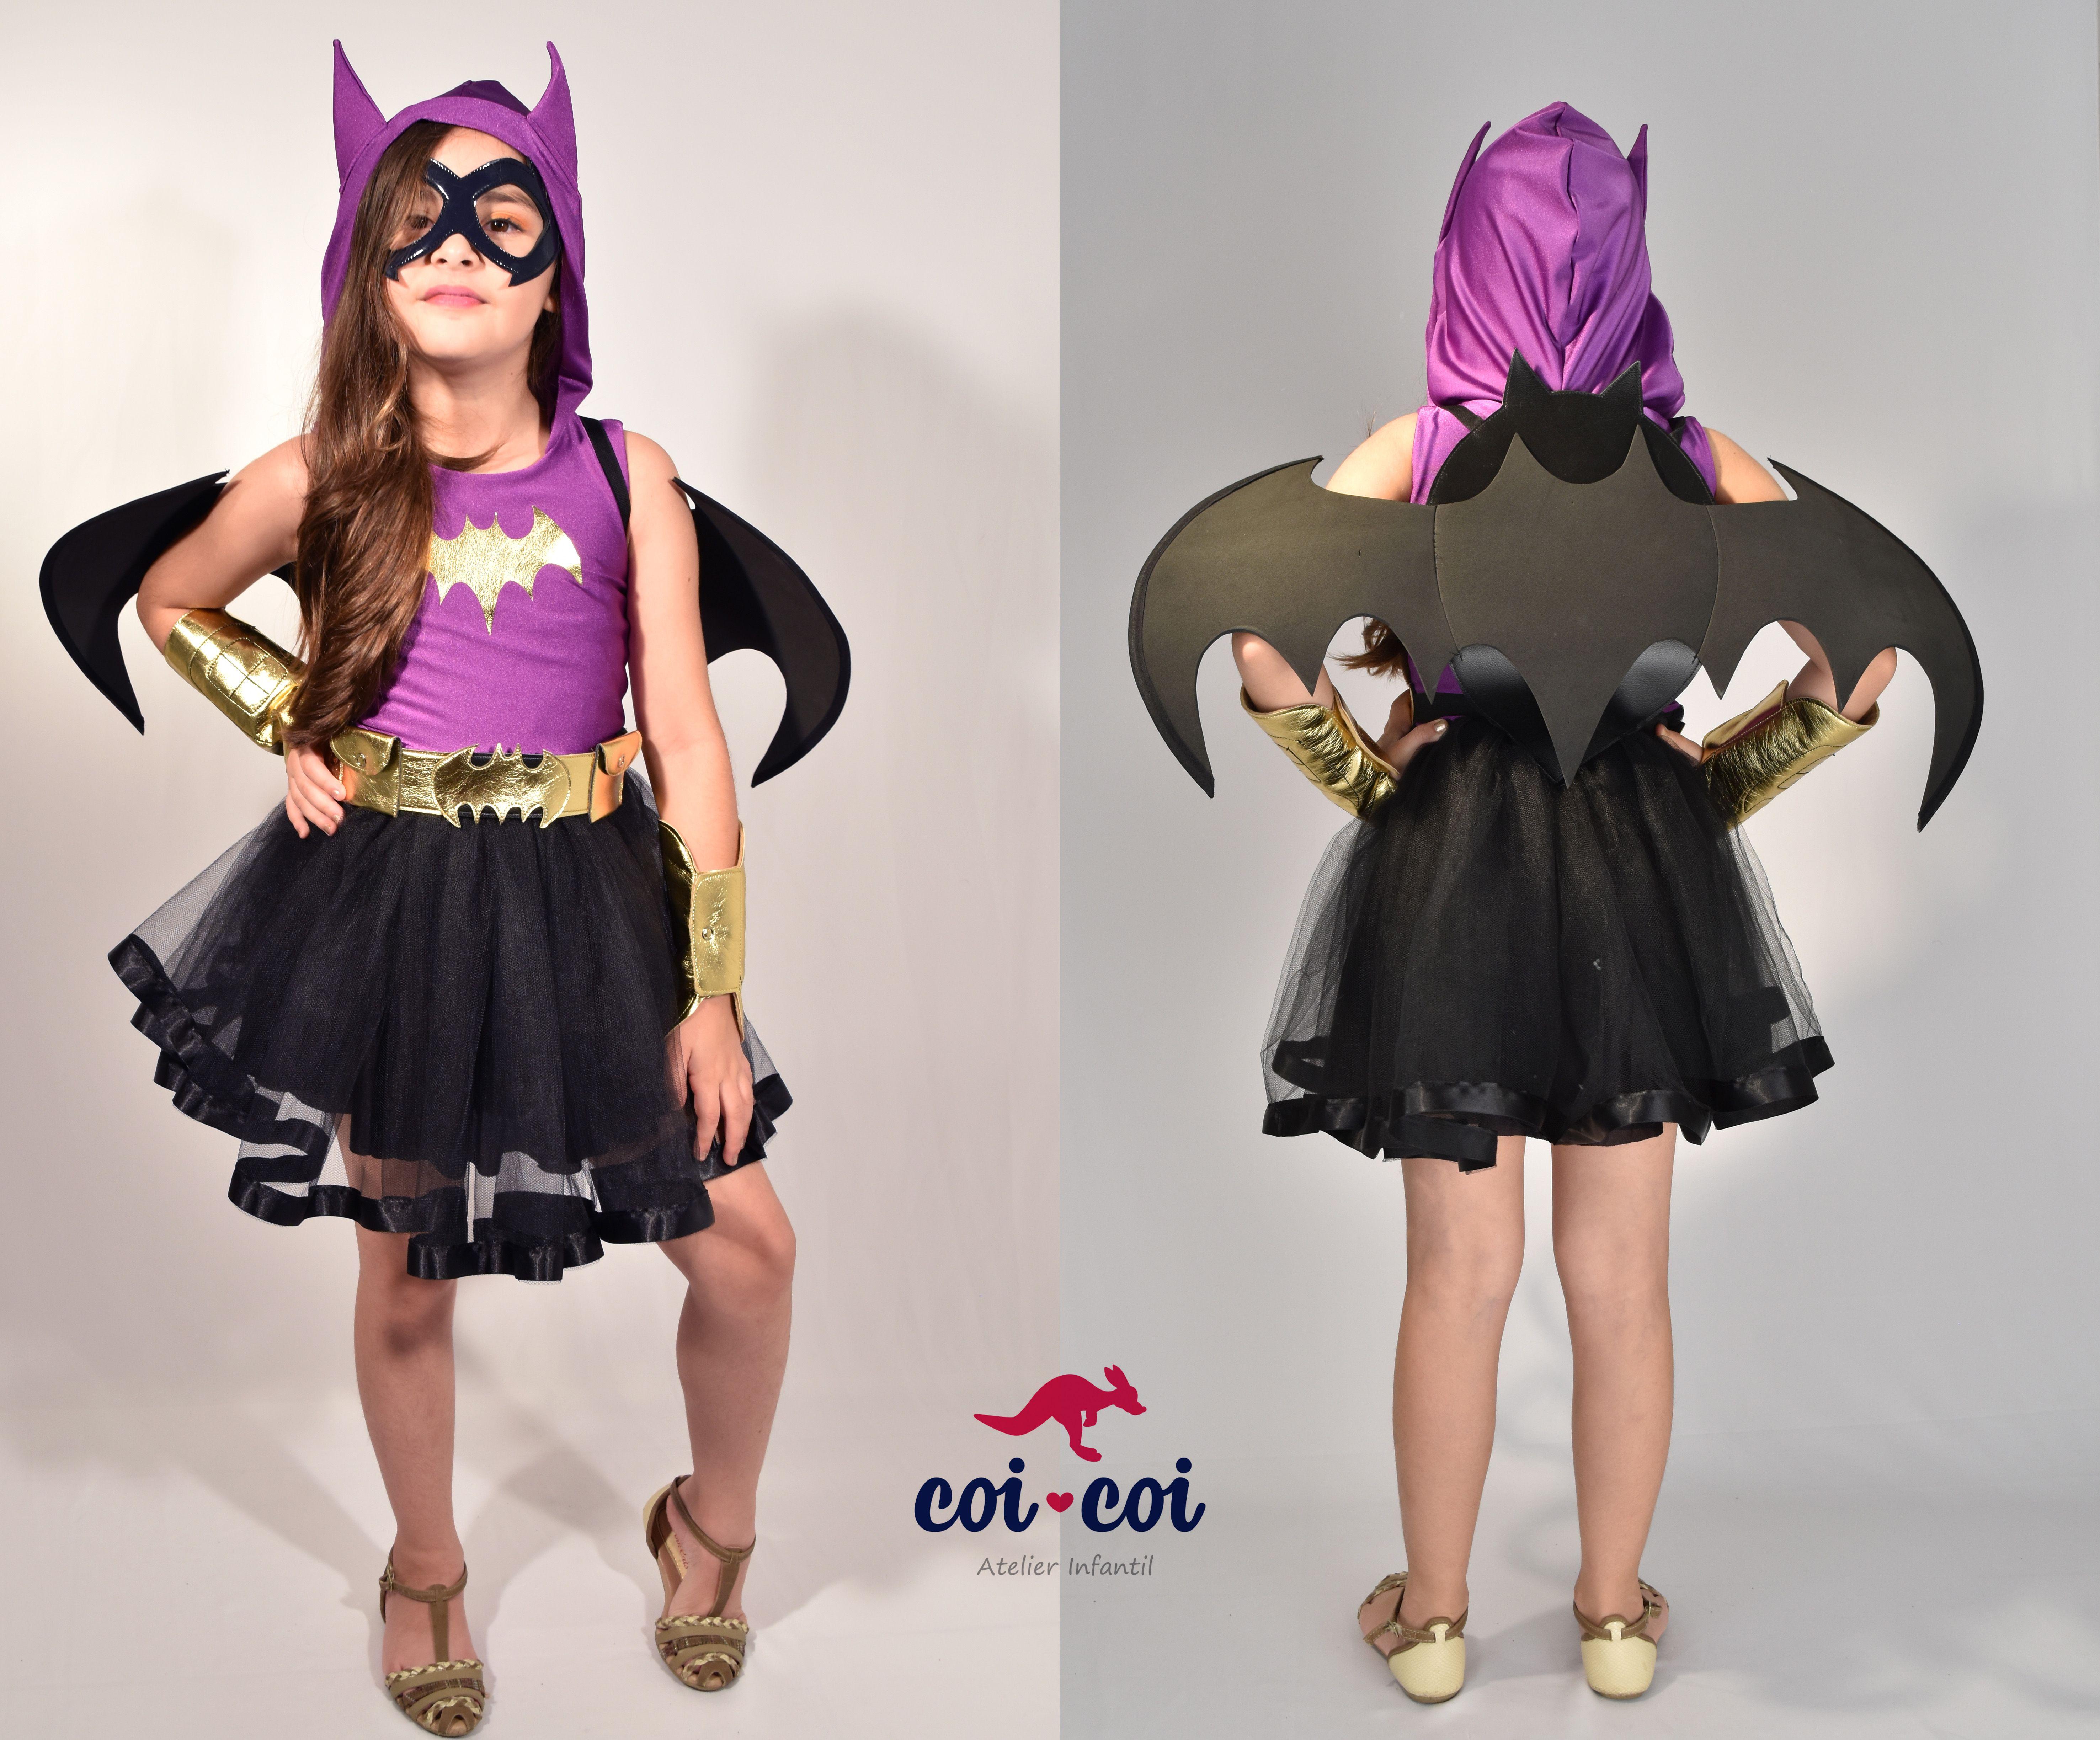 d16b8a42f20576 Fantasia Infantil Batgirl. www.coicoi.com.br | Fantasia em 2019 ...